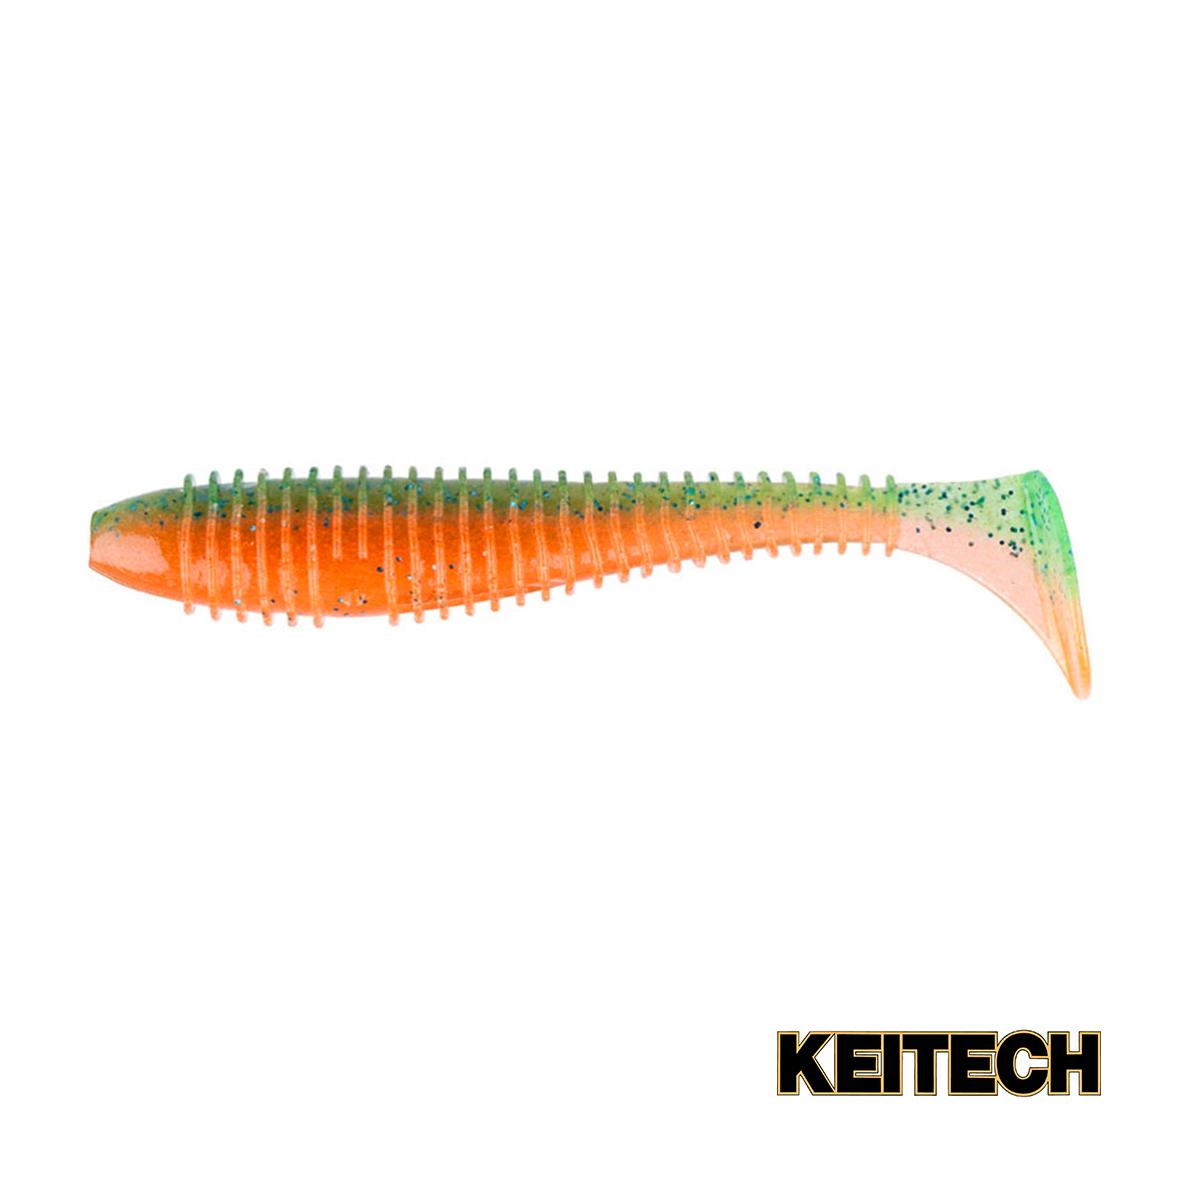 "Силикон Keitech Swing Impact FAT 2.8"" (8 шт/упак) ц:pal#11 rotten"